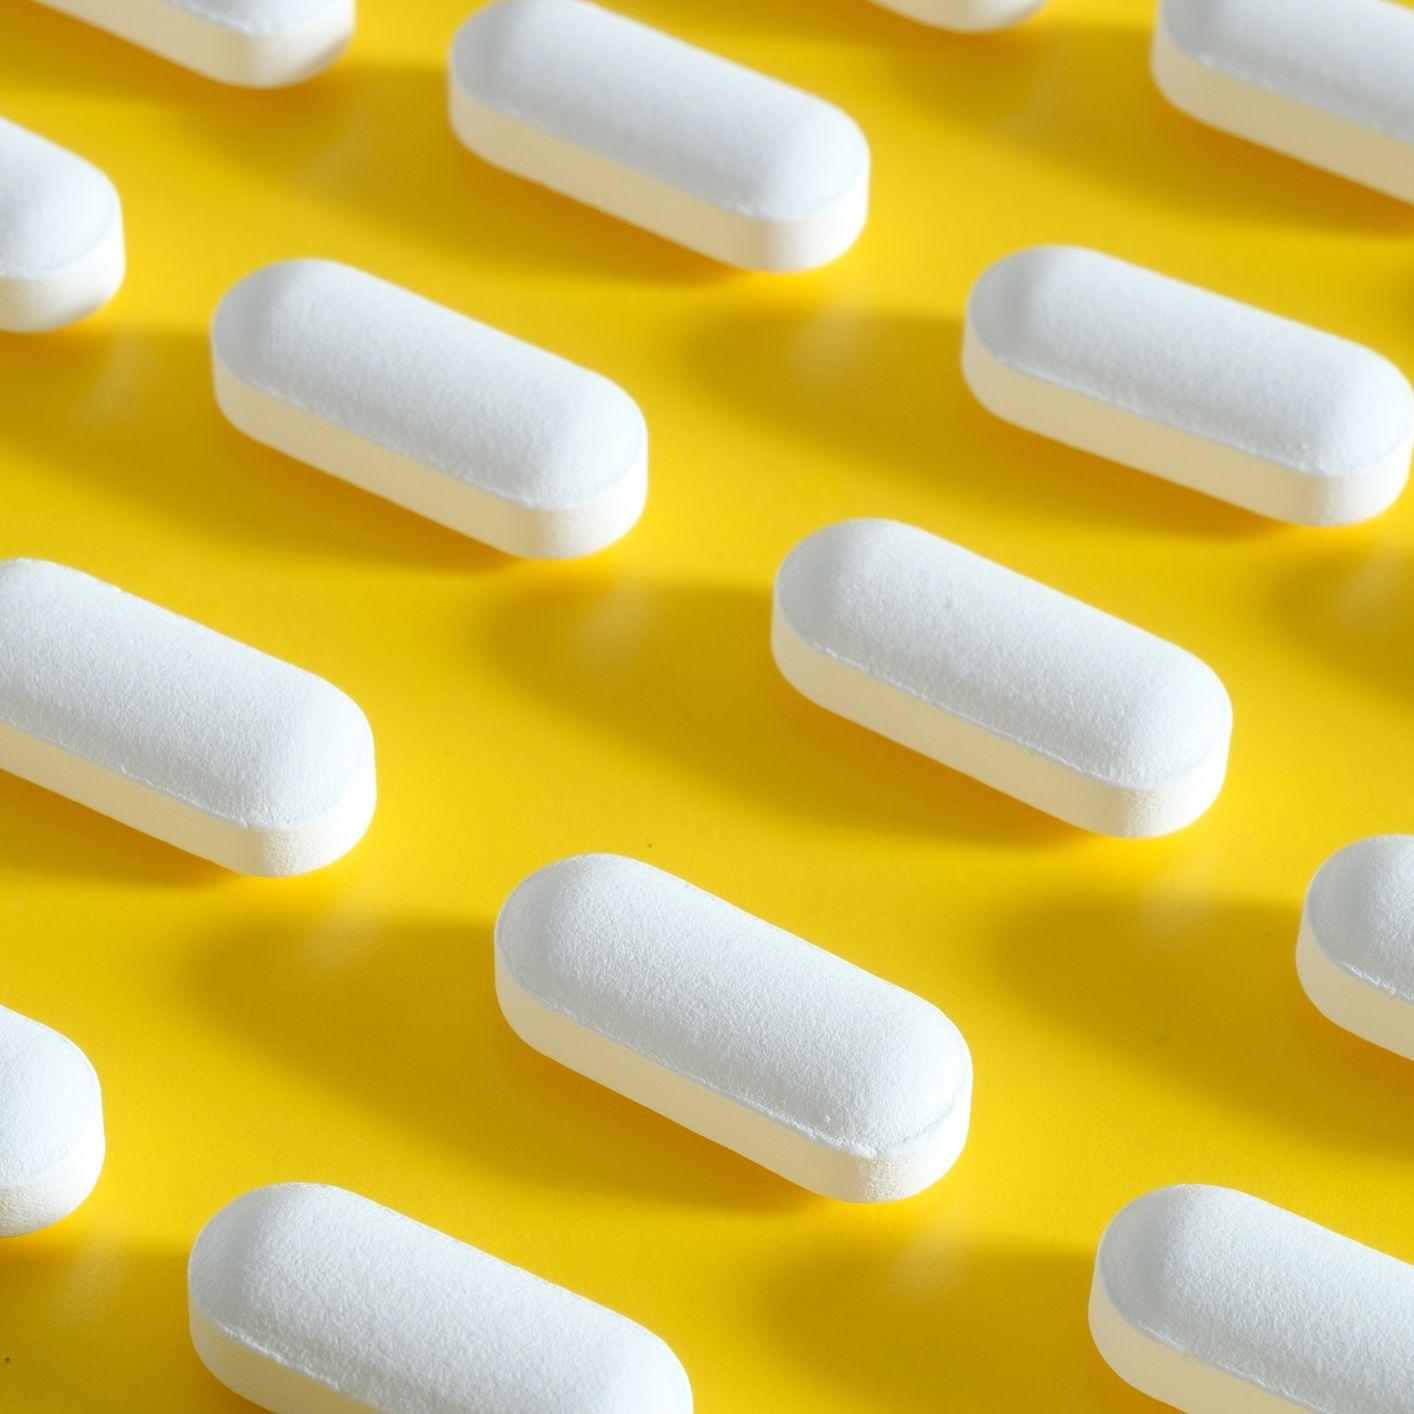 Here's When It's Smart to Skip Antibiotics, According to Doctors